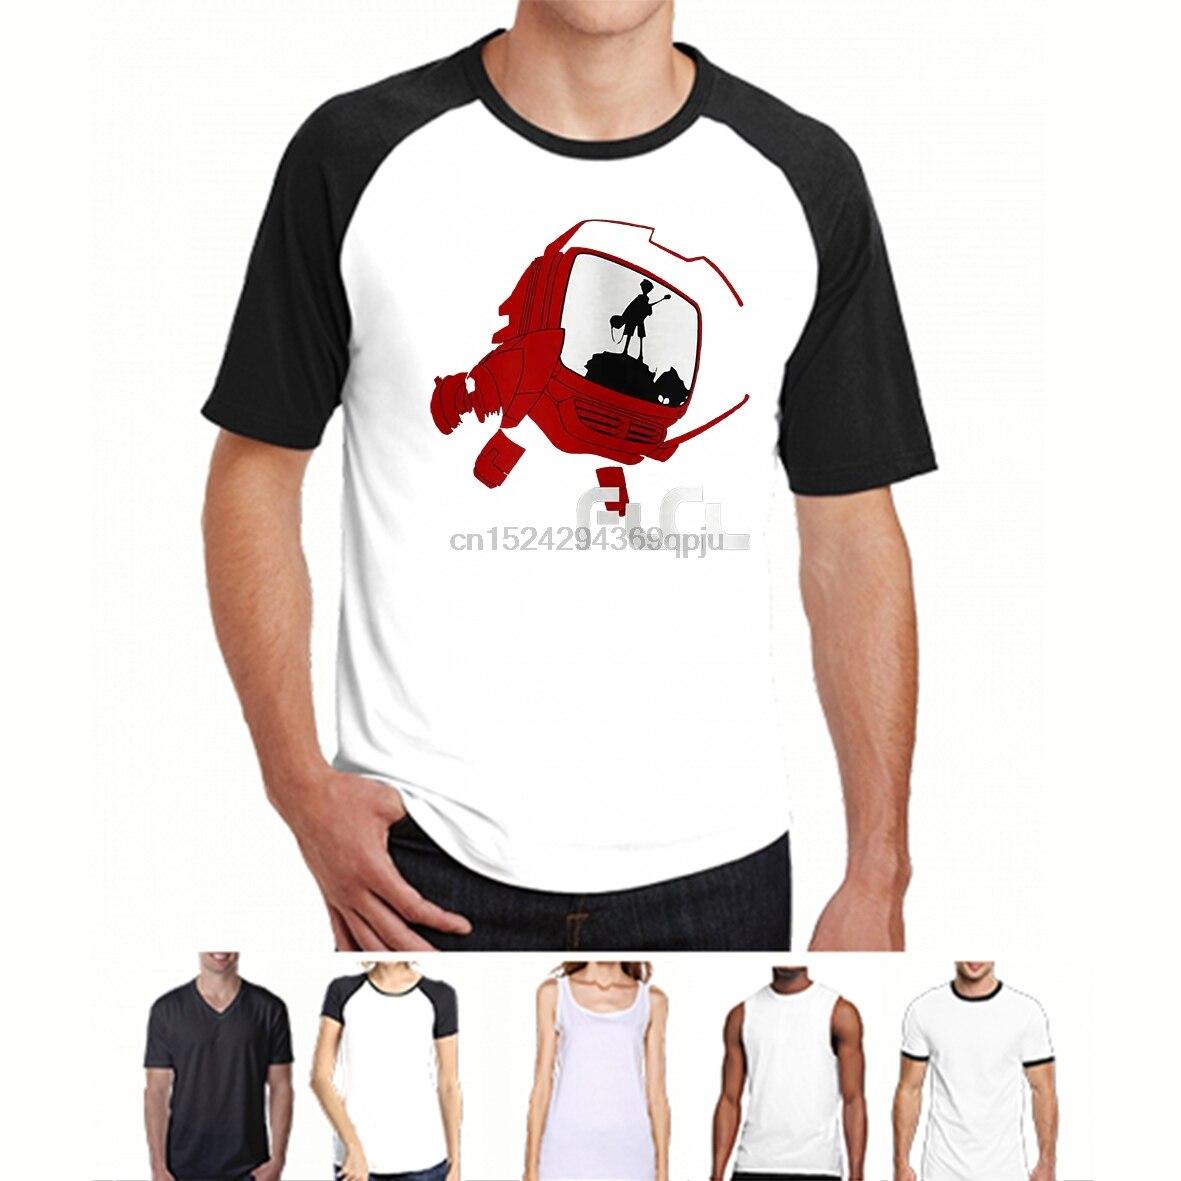 FLCL Lord Canti Fooly Cooly Camiseta de Manga de Anime nuevas camisetas divertidas camisetas nuevas Unisex divertidas Tops